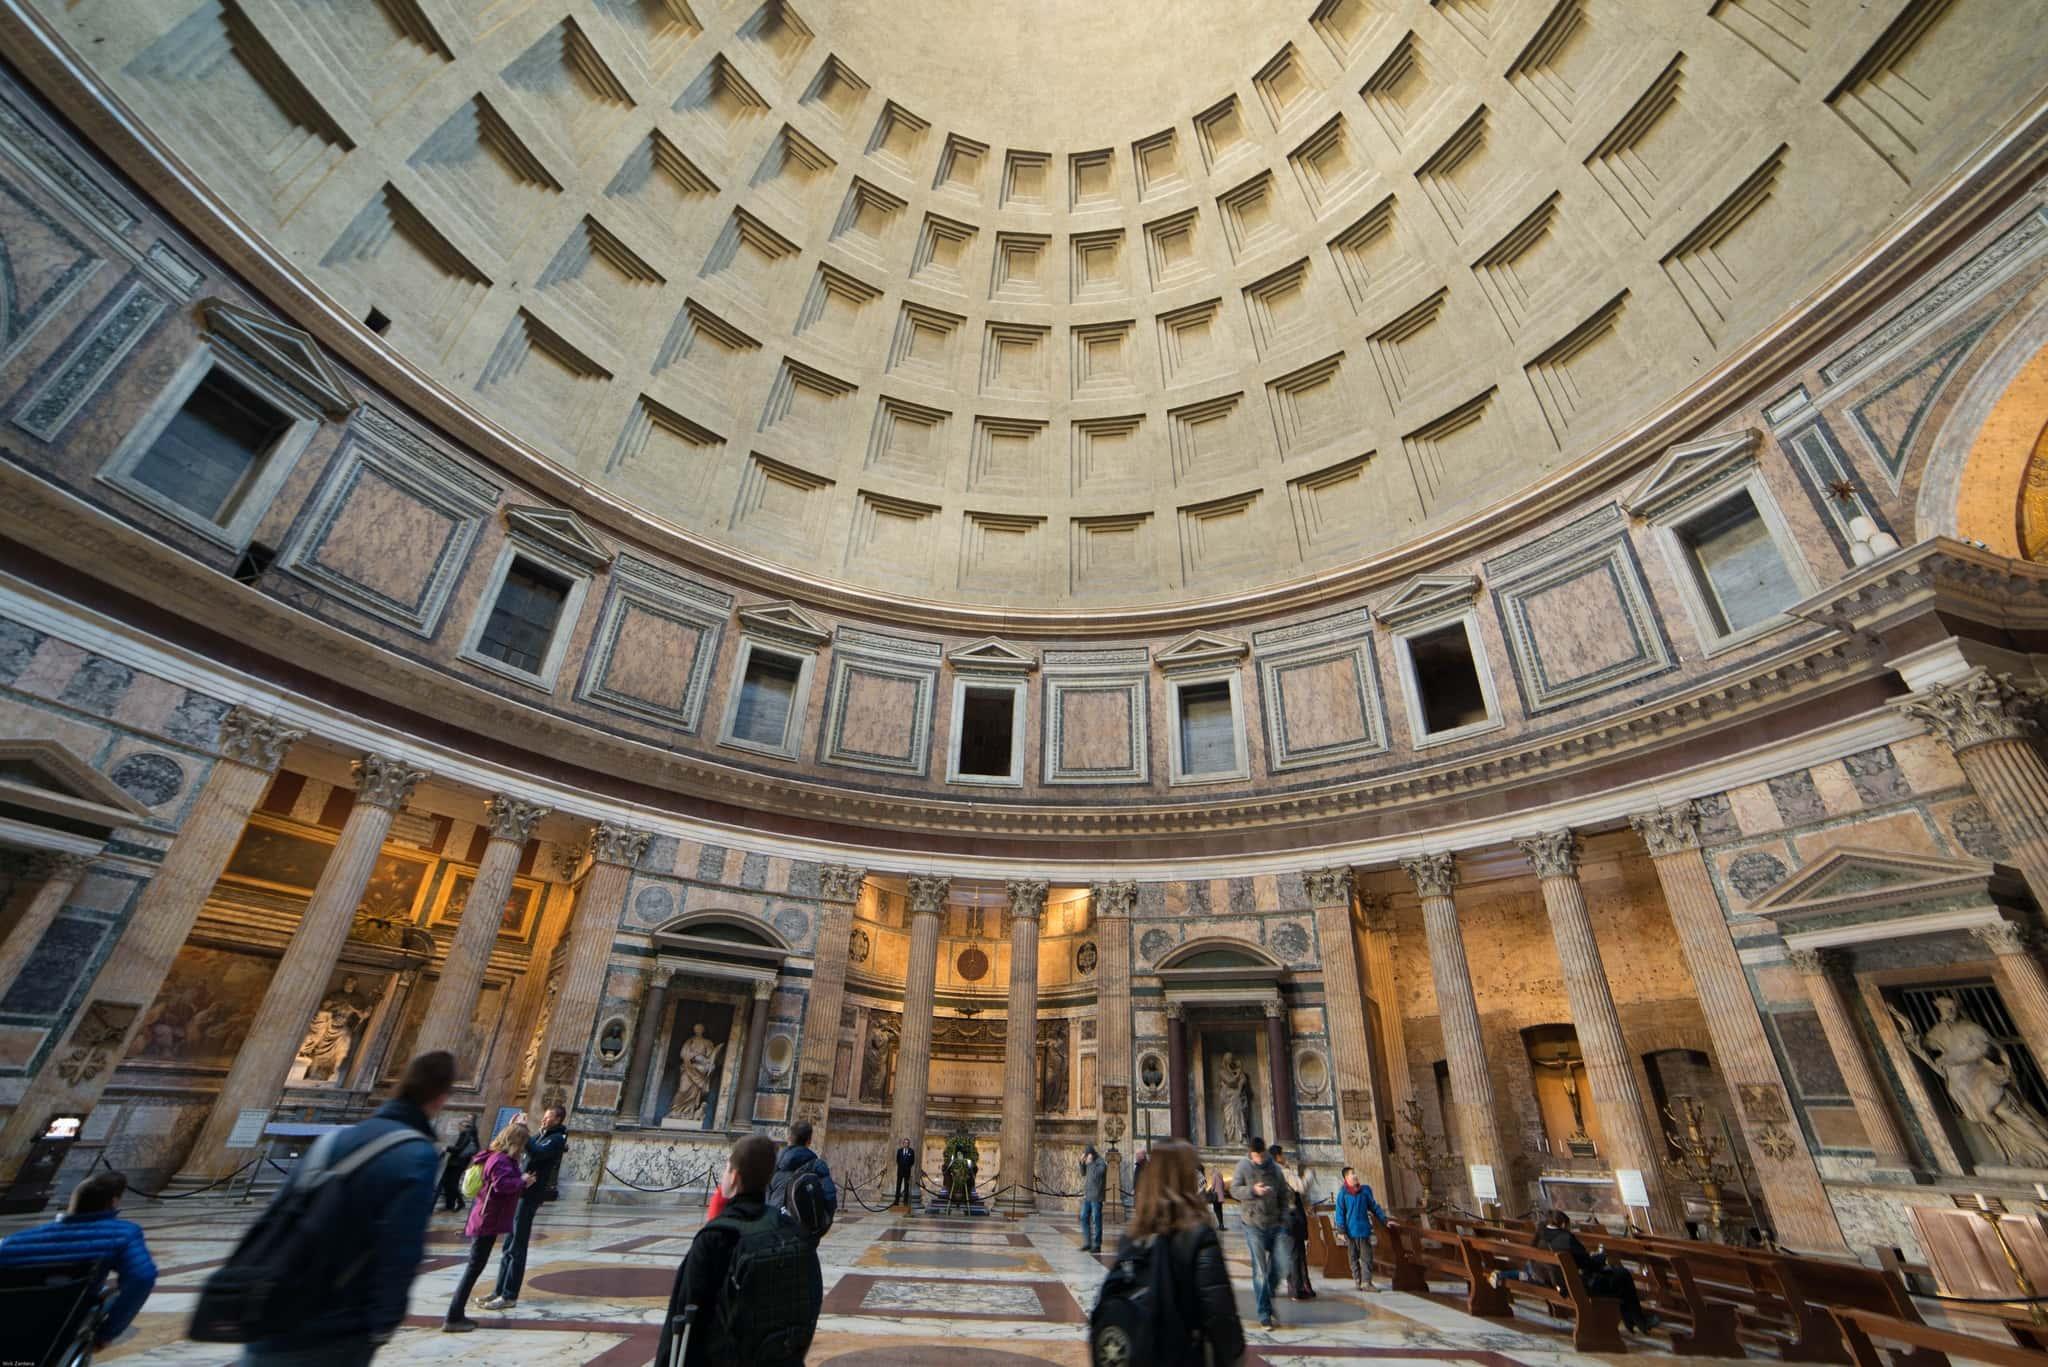 Pantheon Rome Italy interior tourists